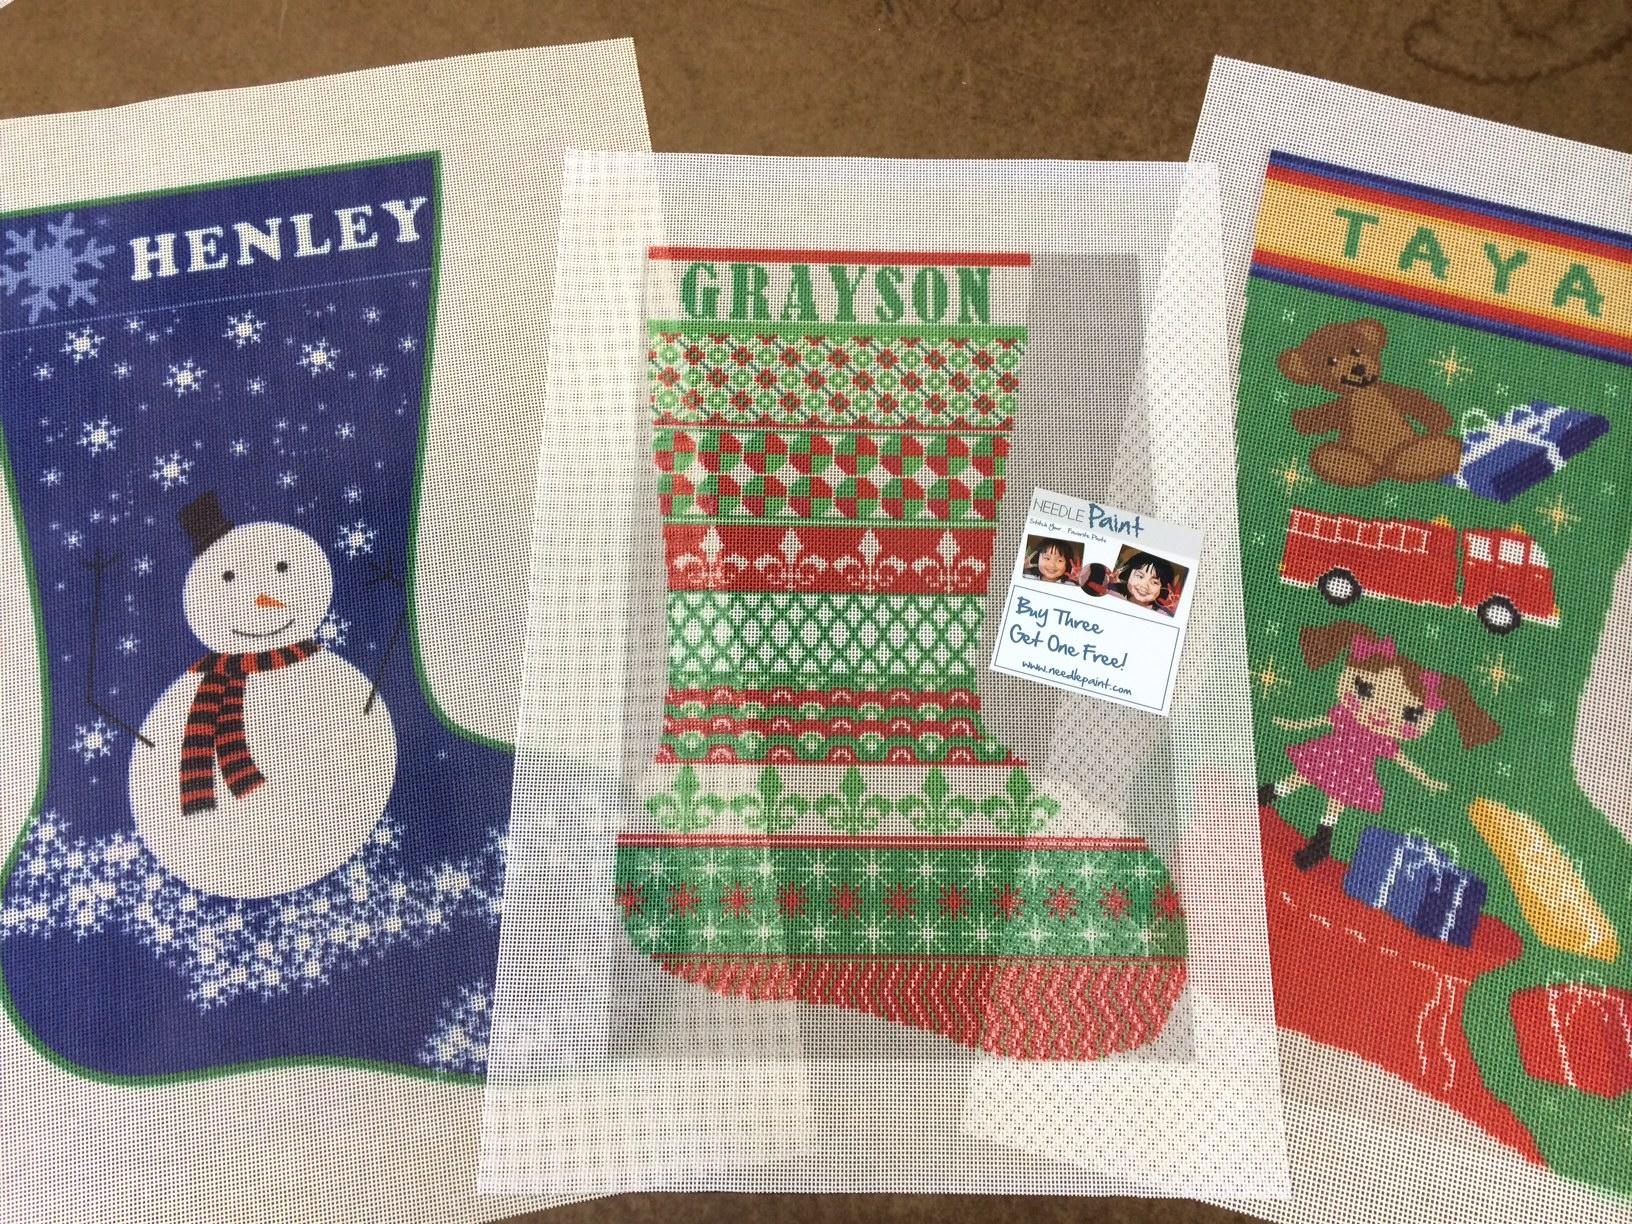 Sensational Personalized Needlepoint Christmas Stockings Needlepoint Kits Easy Diy Christmas Decorations Tissureus